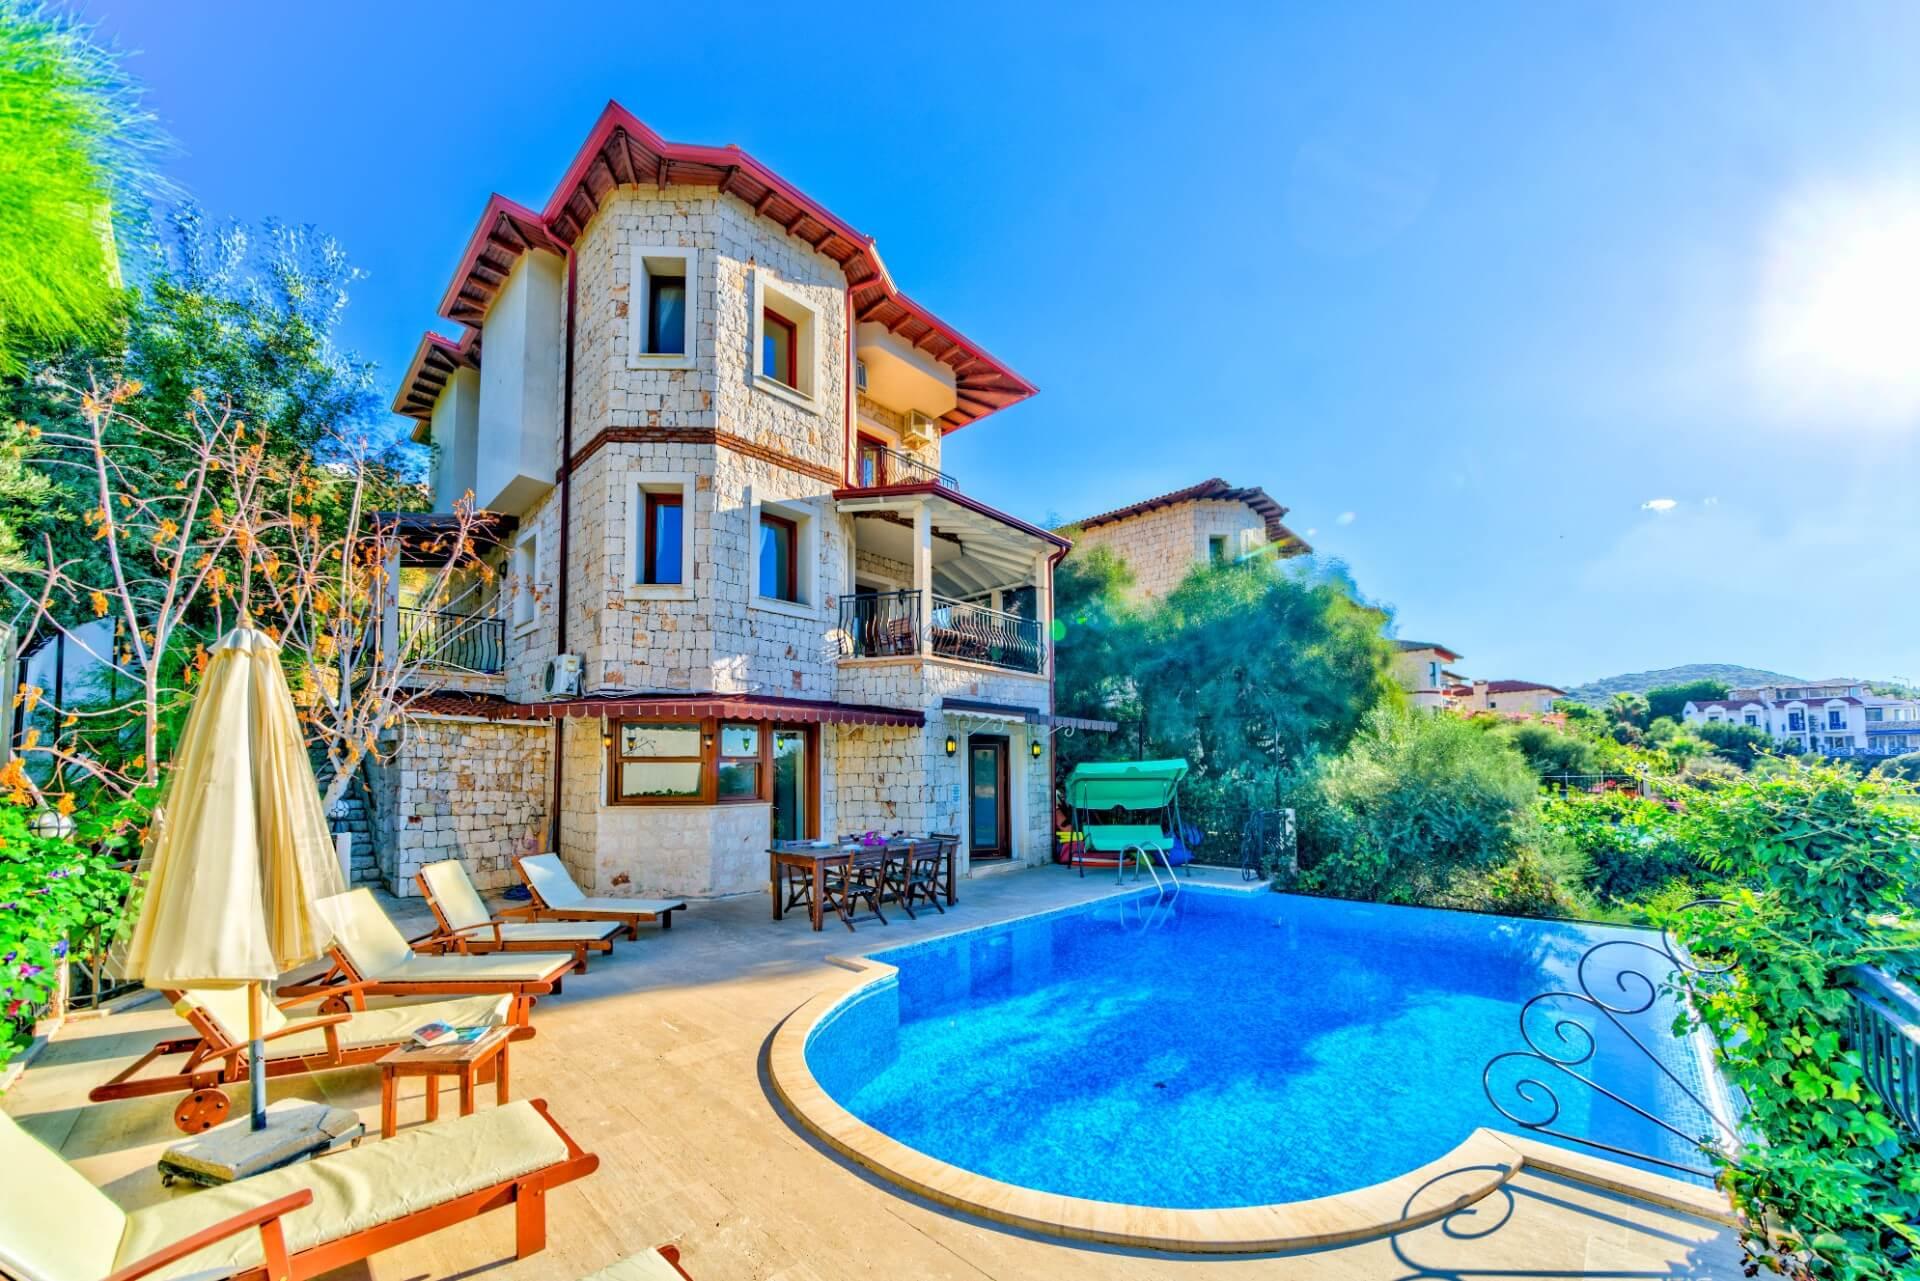 Villa Noa : Huzur Ve Konfor Bir Arada | Fidorento dedans Super U Salon De Jardin